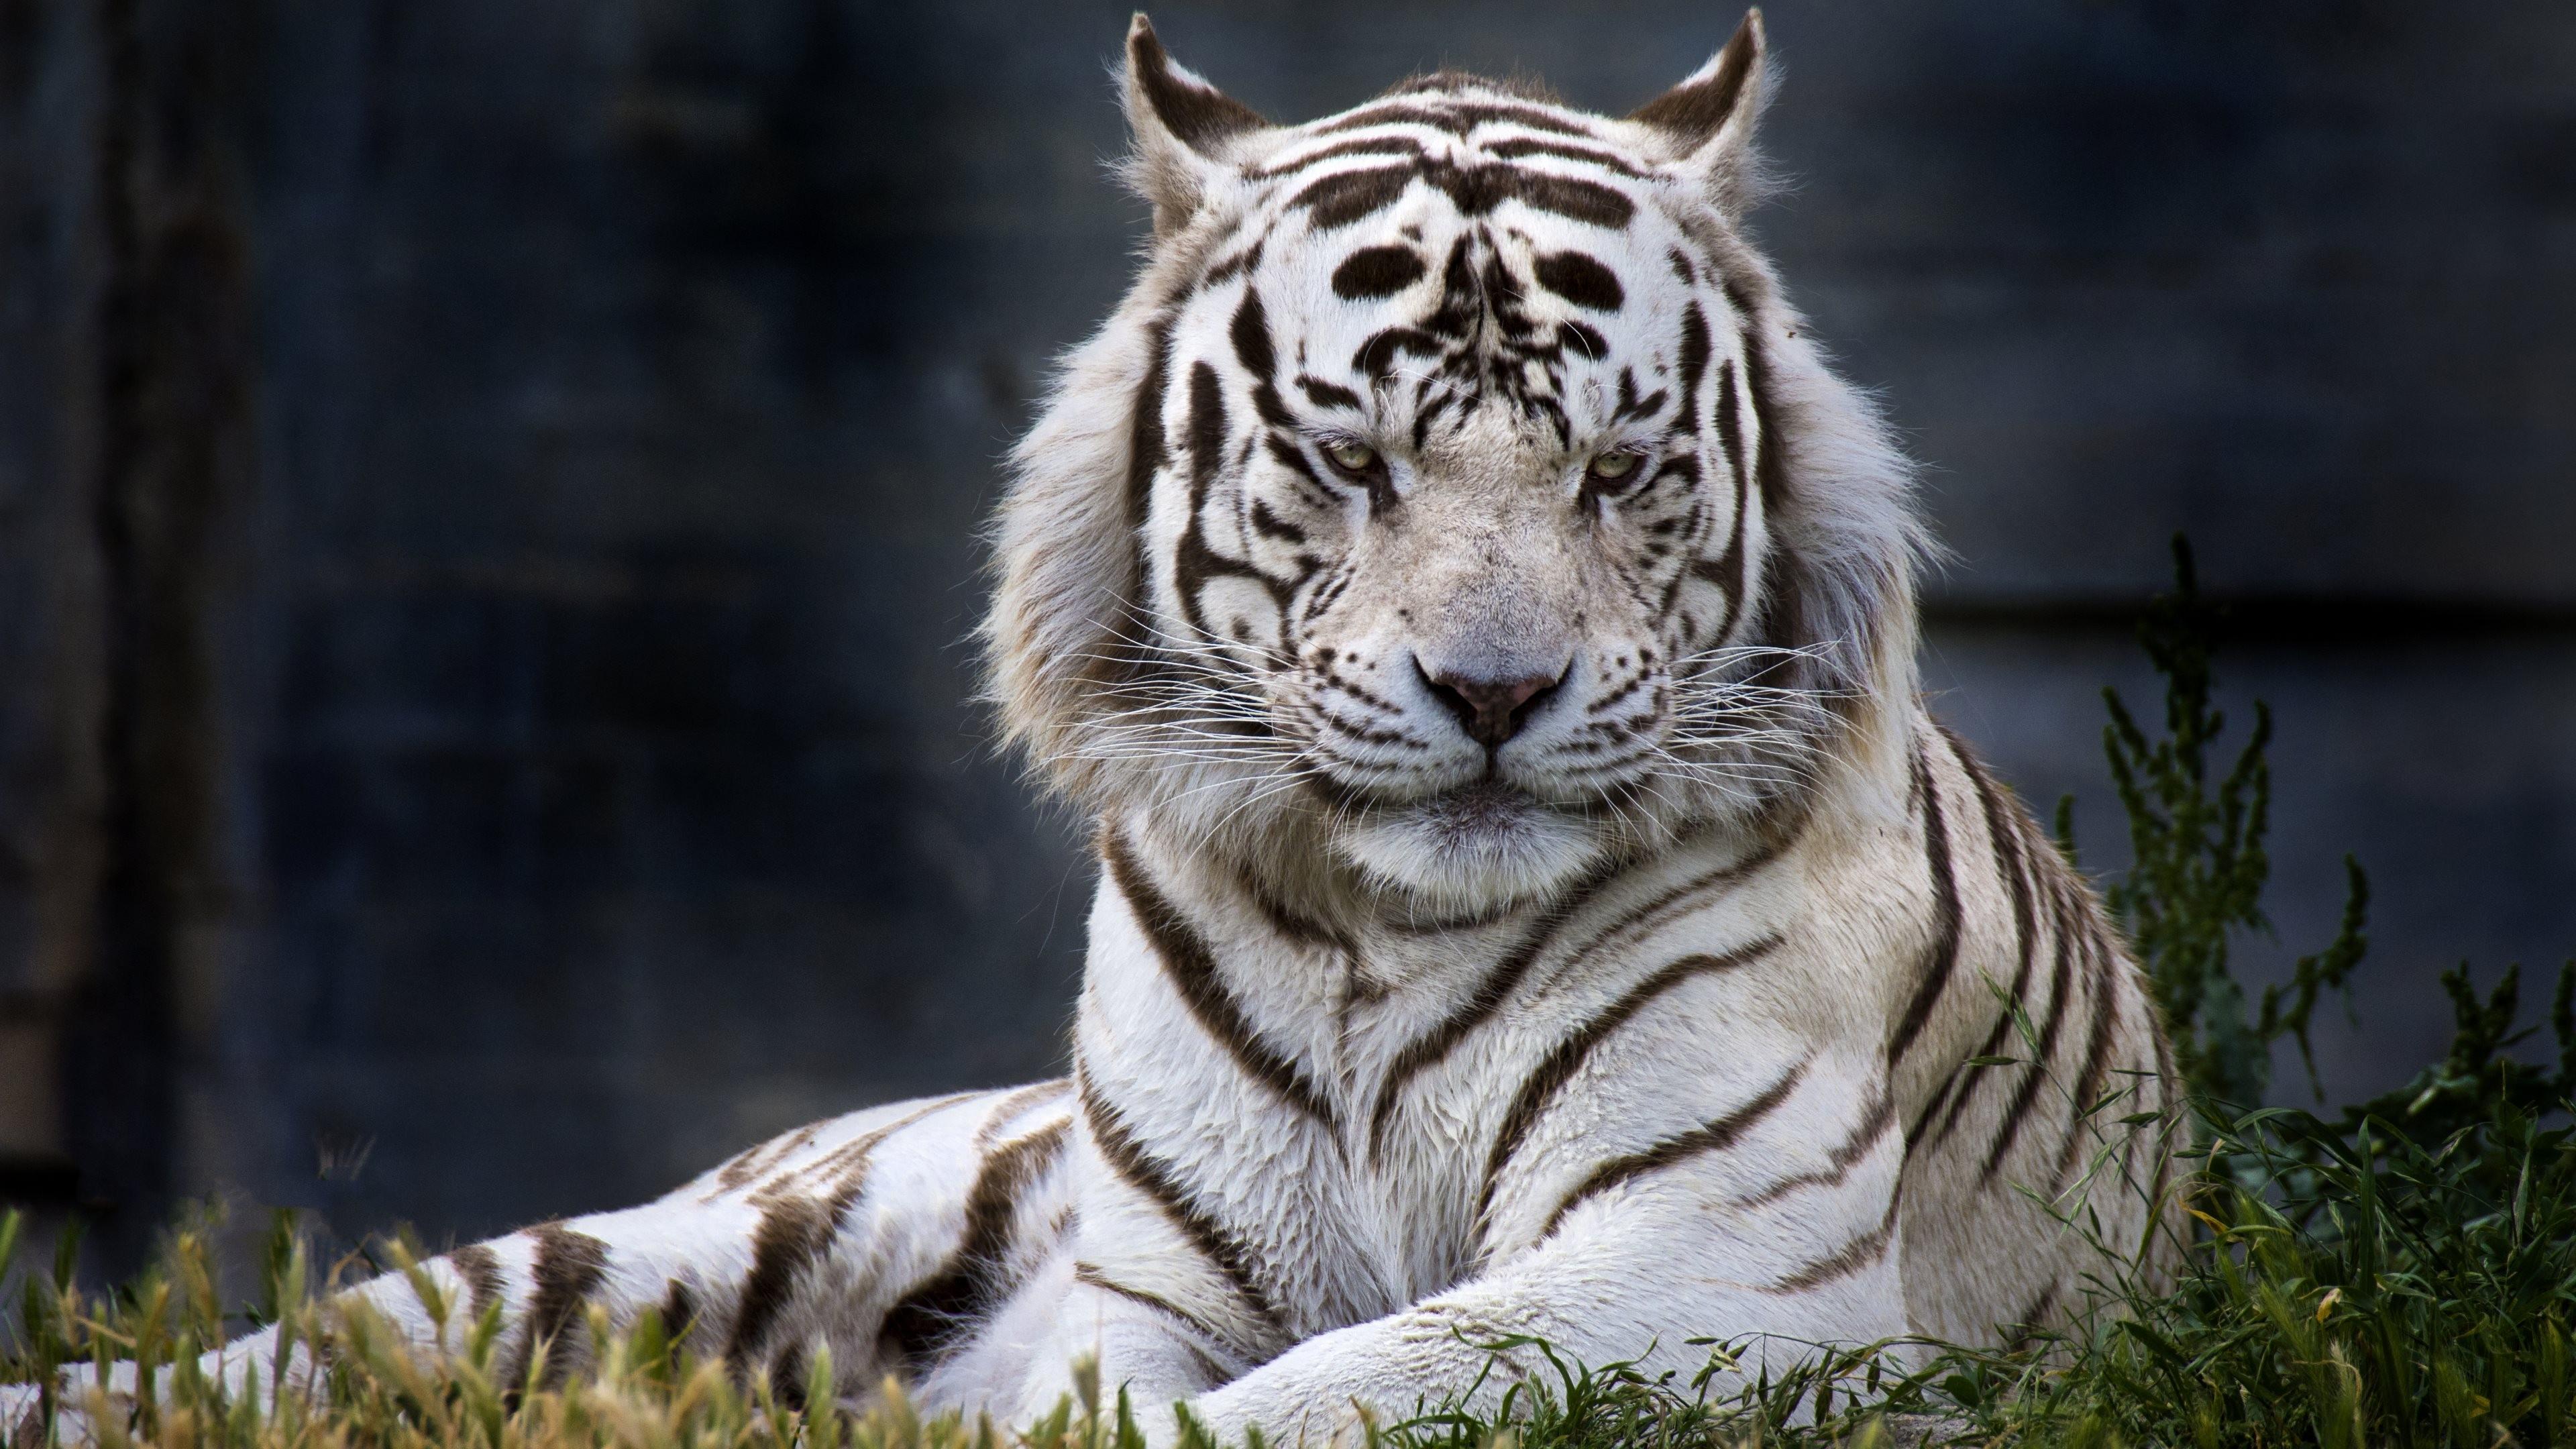 19+ 4k Tiger Wallpapers on WallpaperSafari